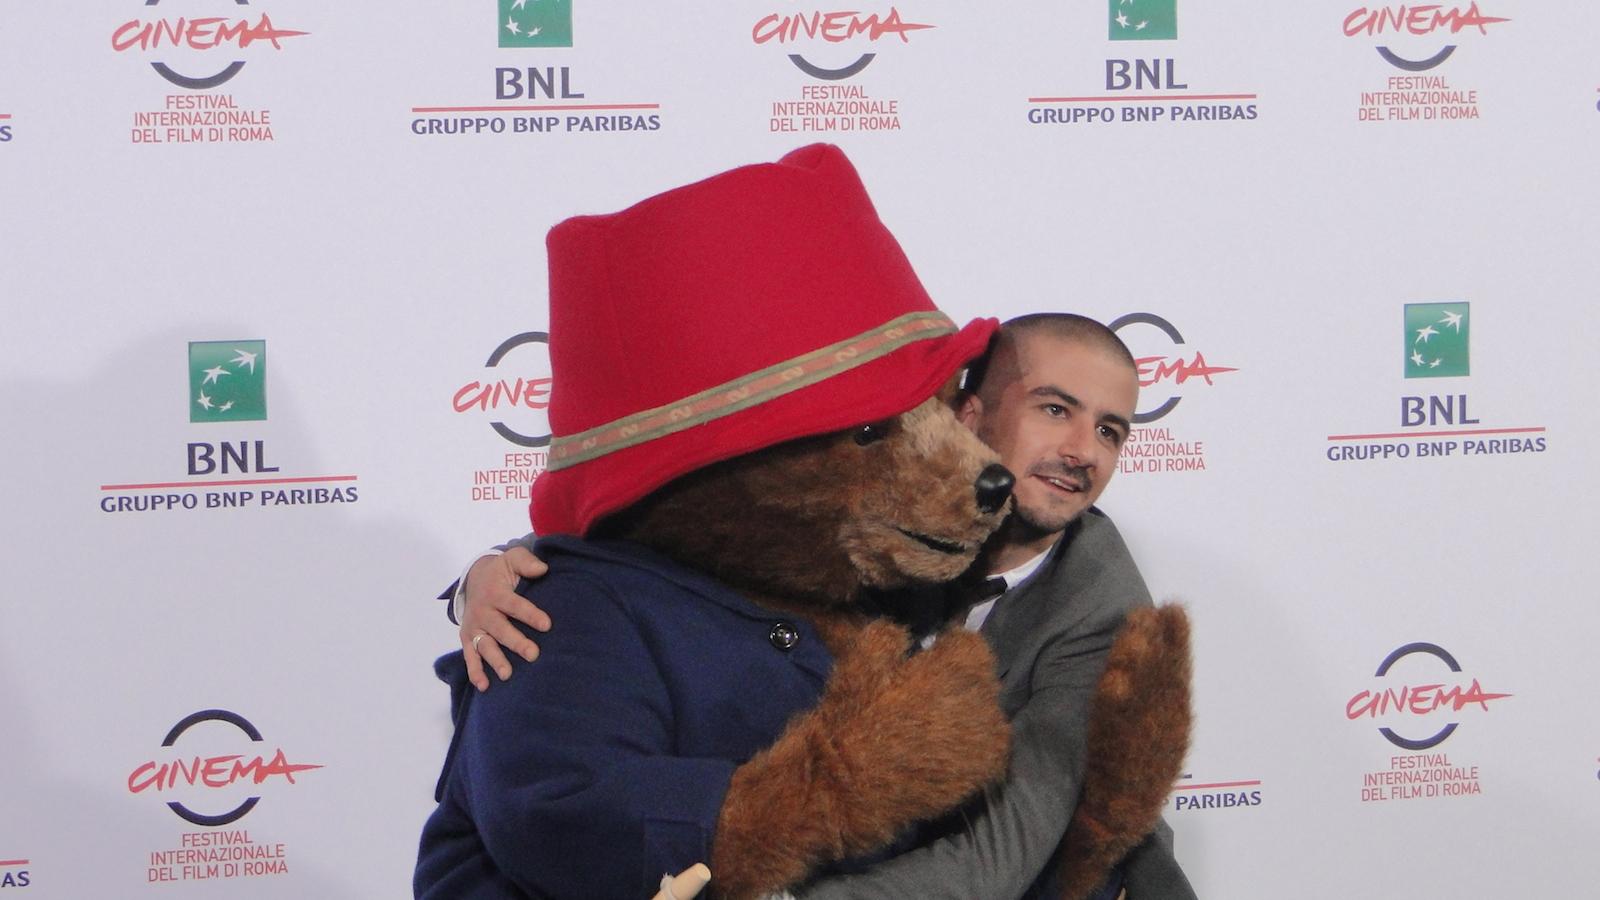 Paddington: Francesco Mandelli abbraccia l'orso al photocall di Roma 2014